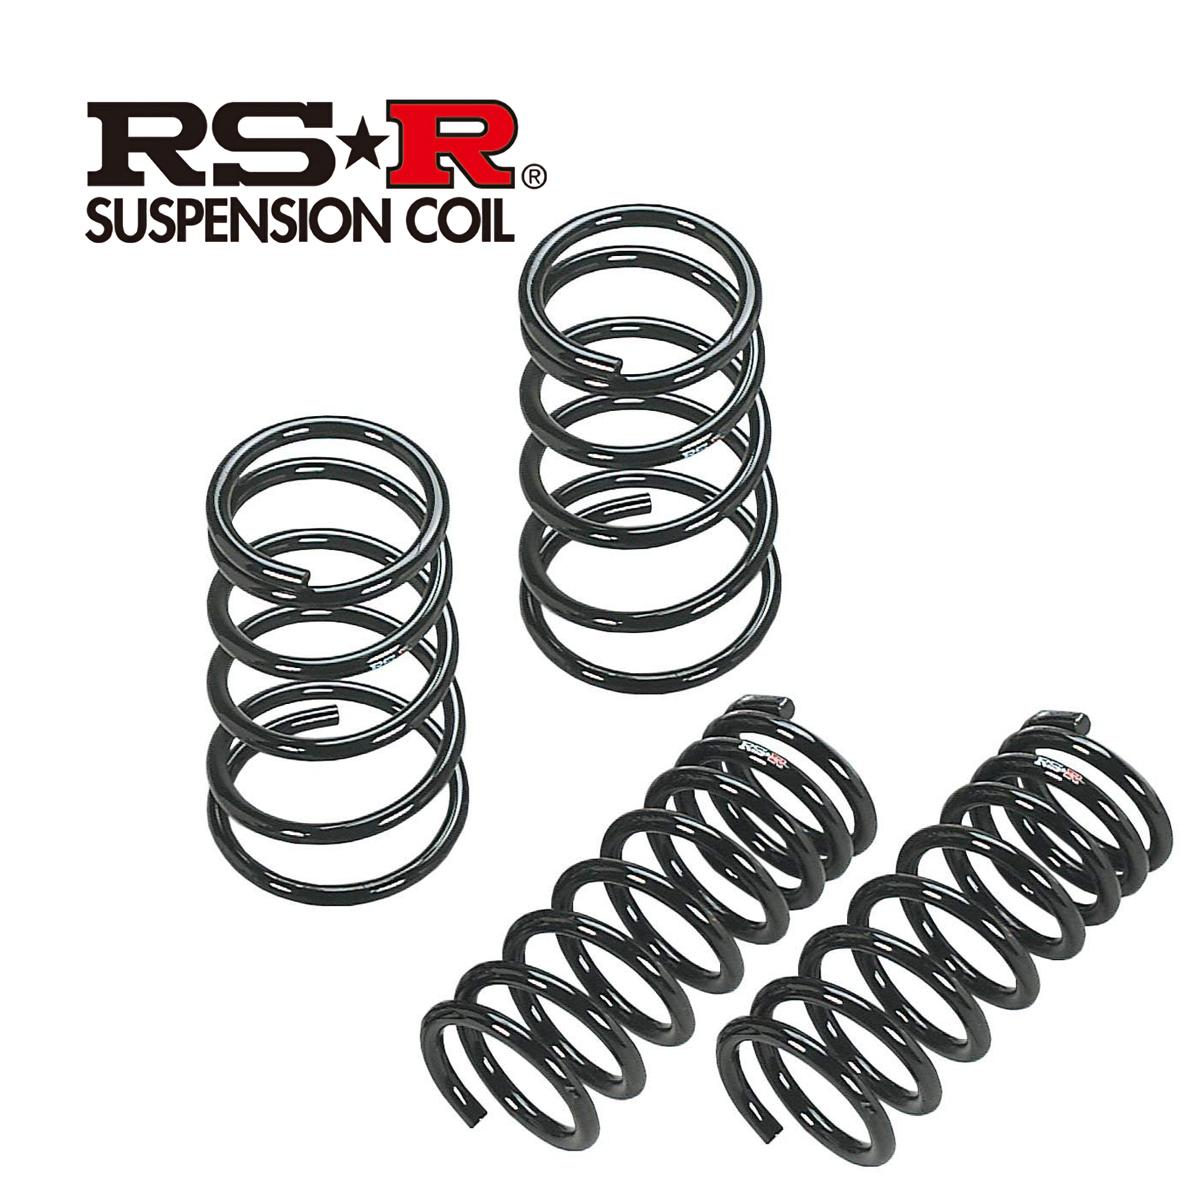 RS-R オデッセイ アブソルート EXホンダセンシング RC1 ダウンサス スプリング フロント H506WF RSR ダウン RSR 個人宅発送追金有